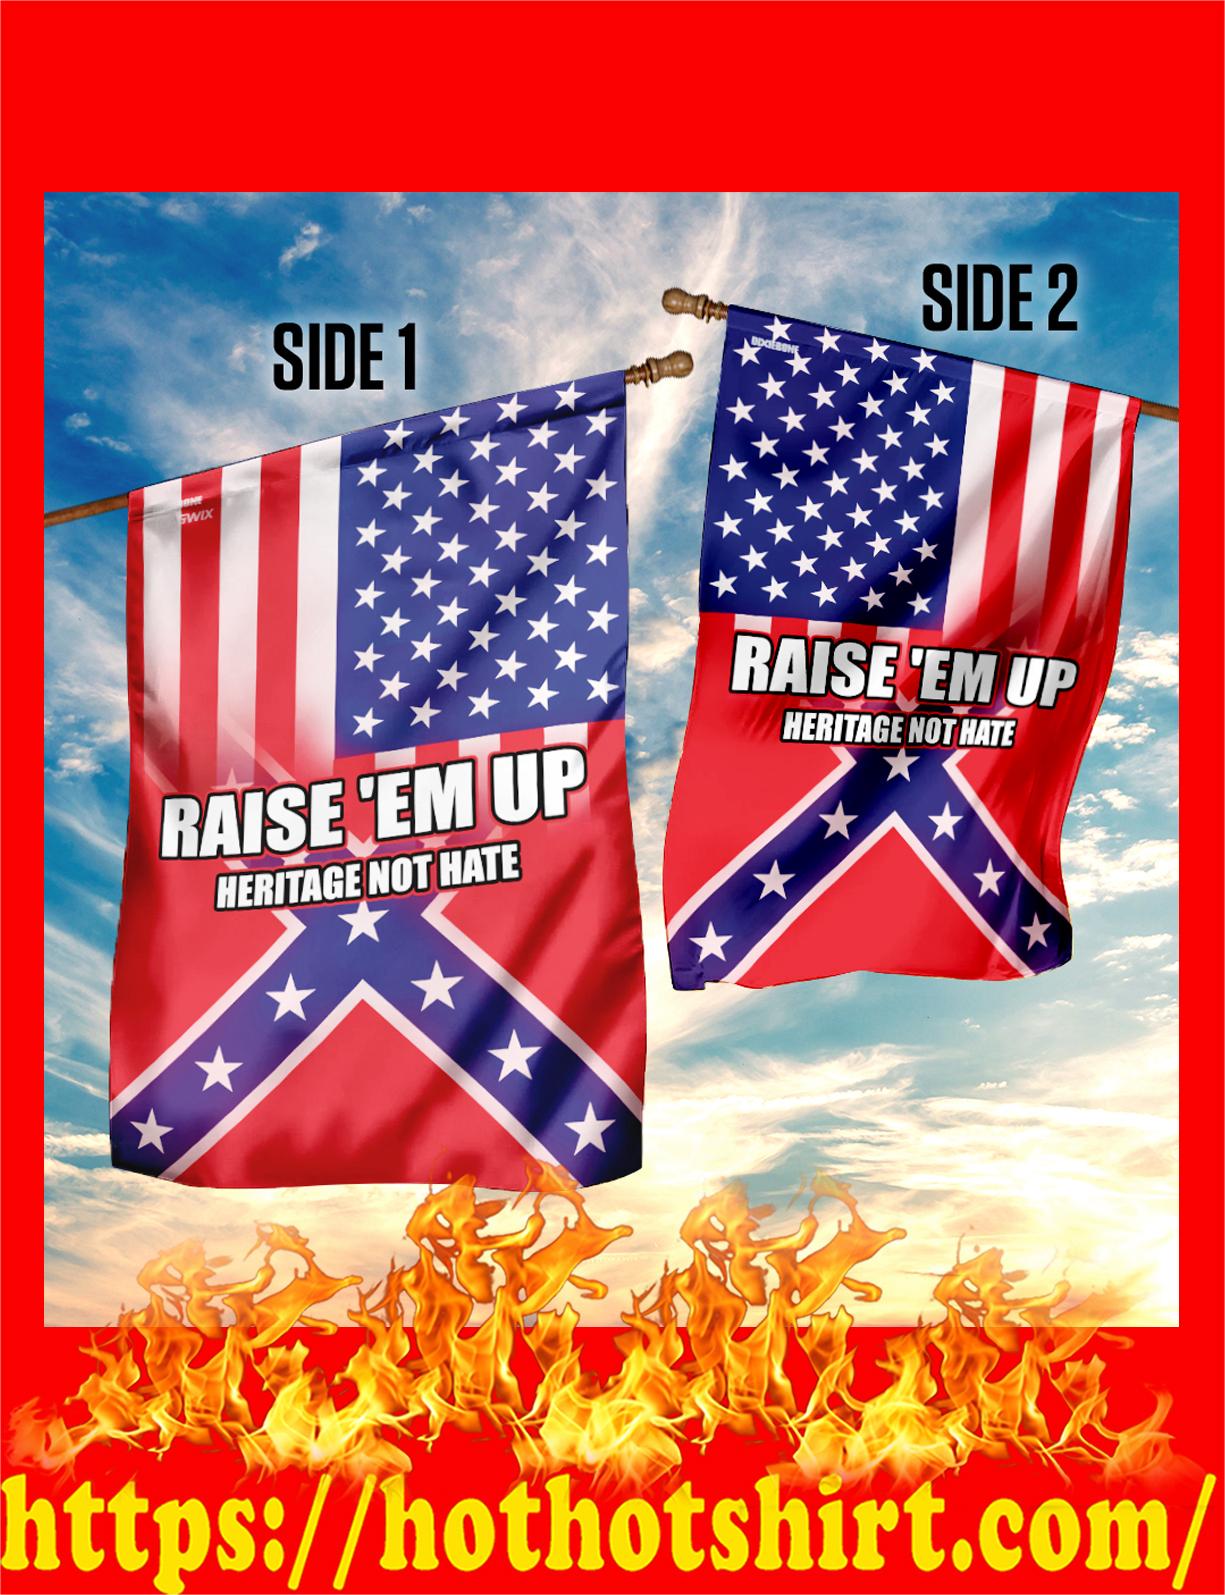 Raidse 'em up herritage not hate confederate american flag